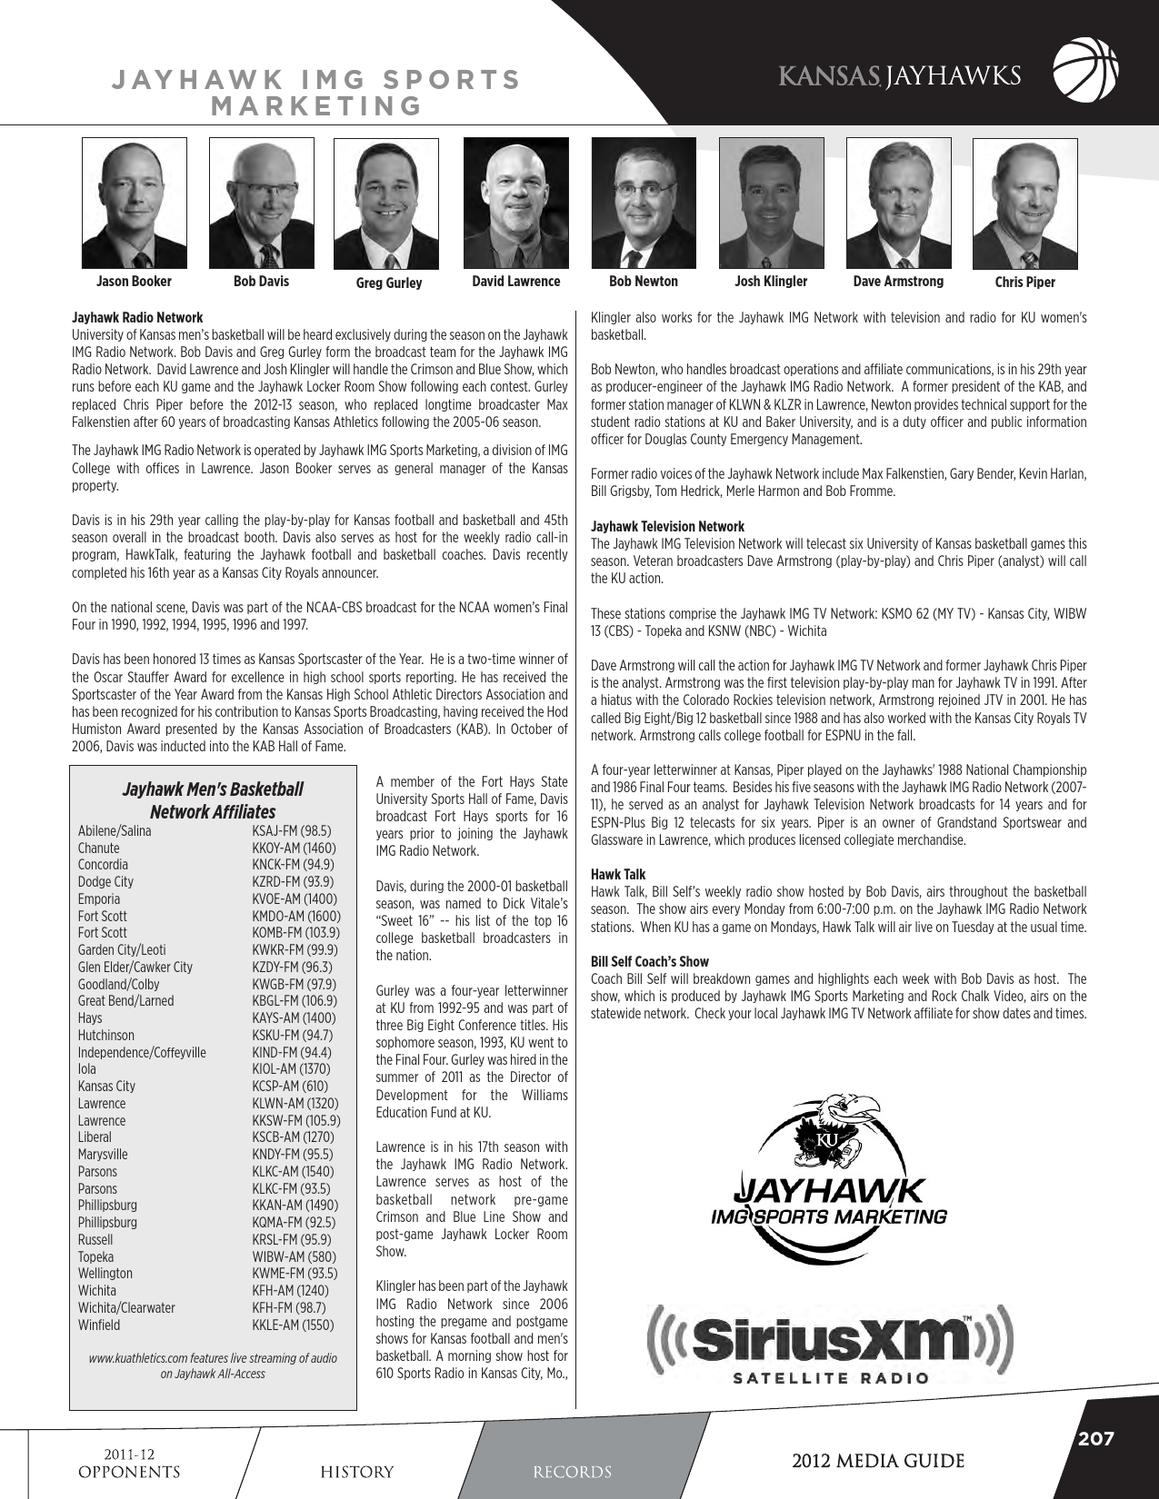 2012-13 Kansas Men's Basketball Media Guide by Kansas Jayhawks - issuu